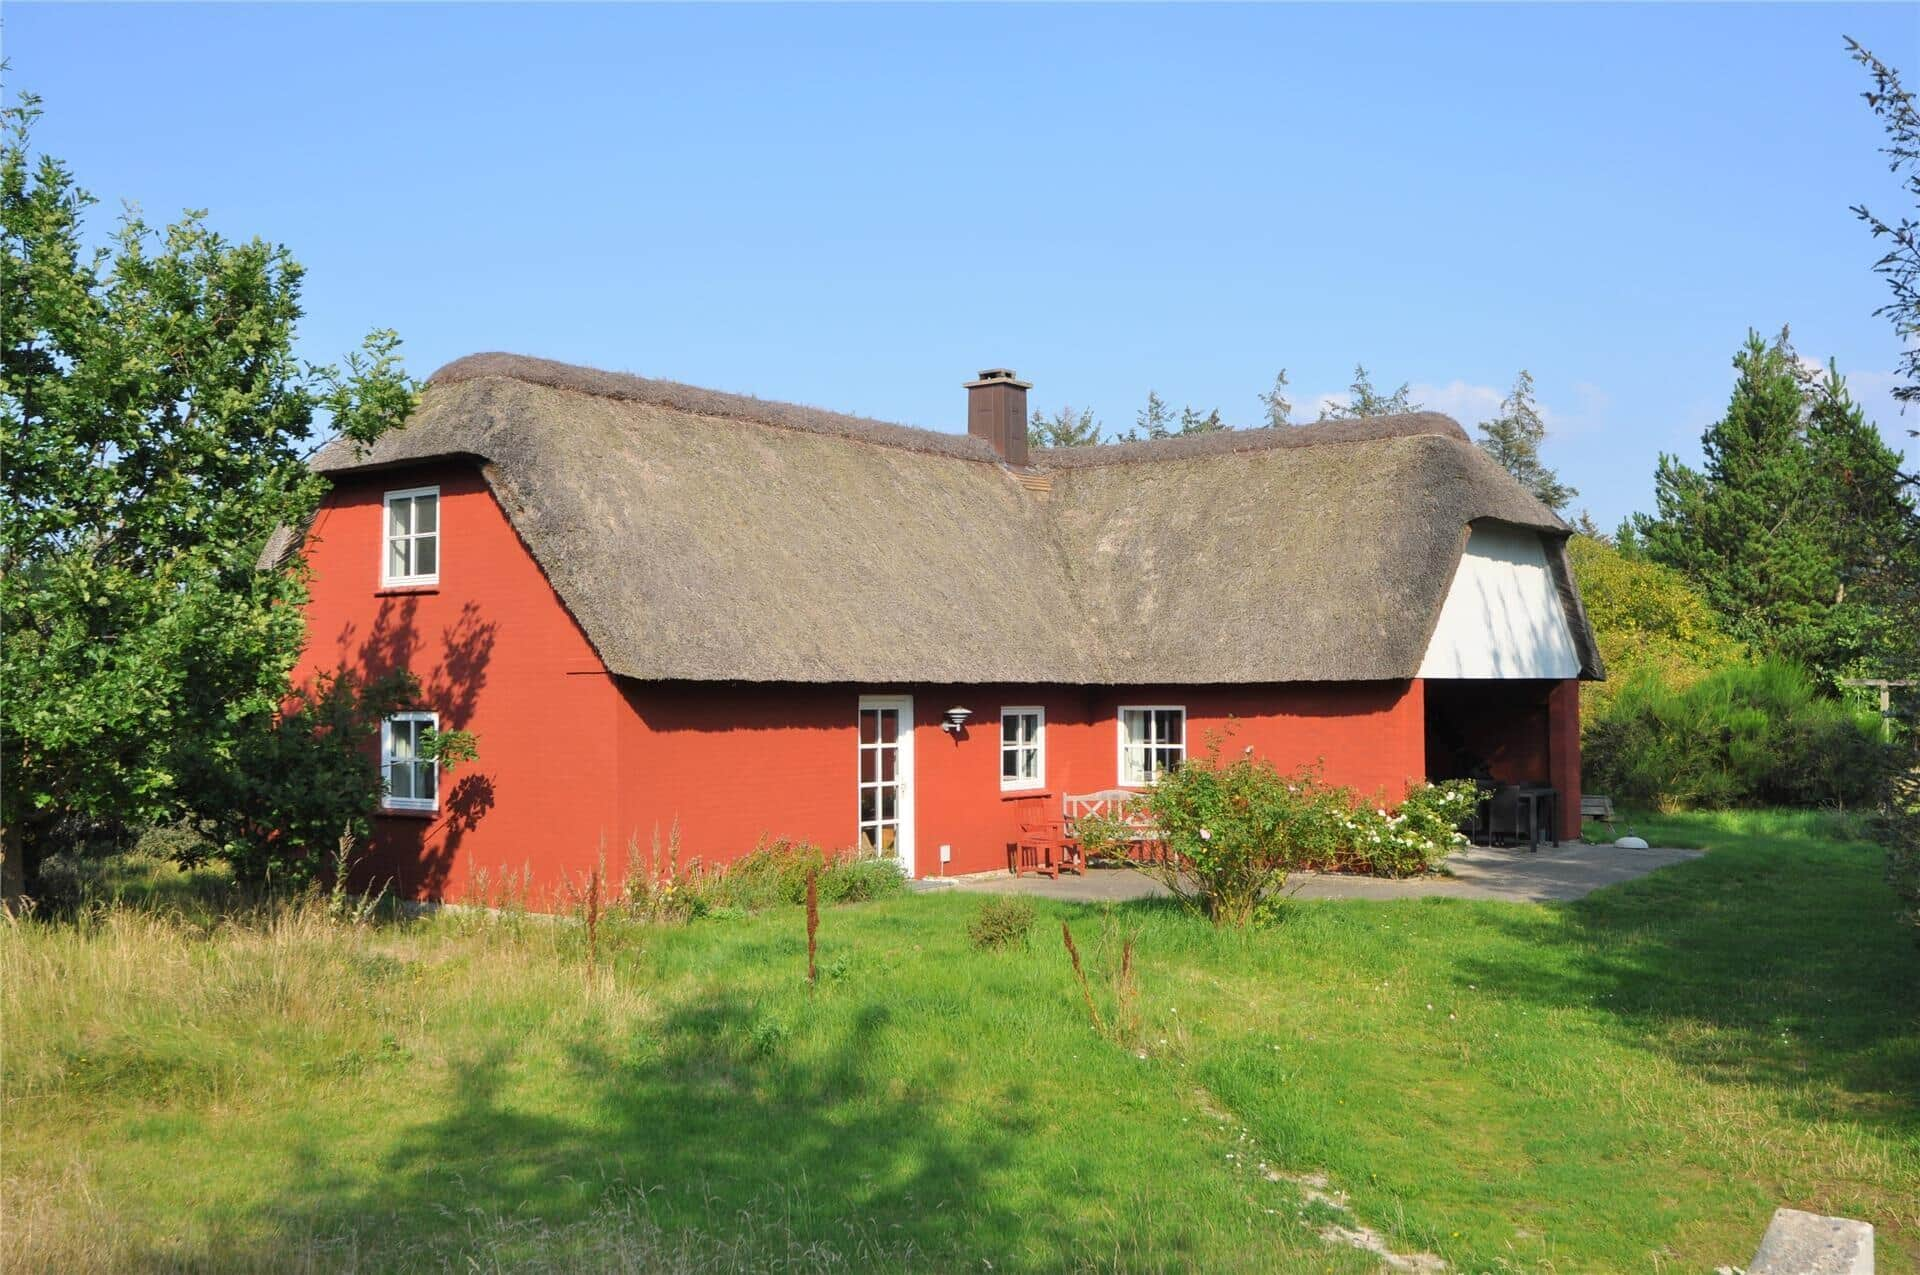 Billede 1-175 Sommerhus 10092, Svollingvej 59, DK - 6990 Ulfborg